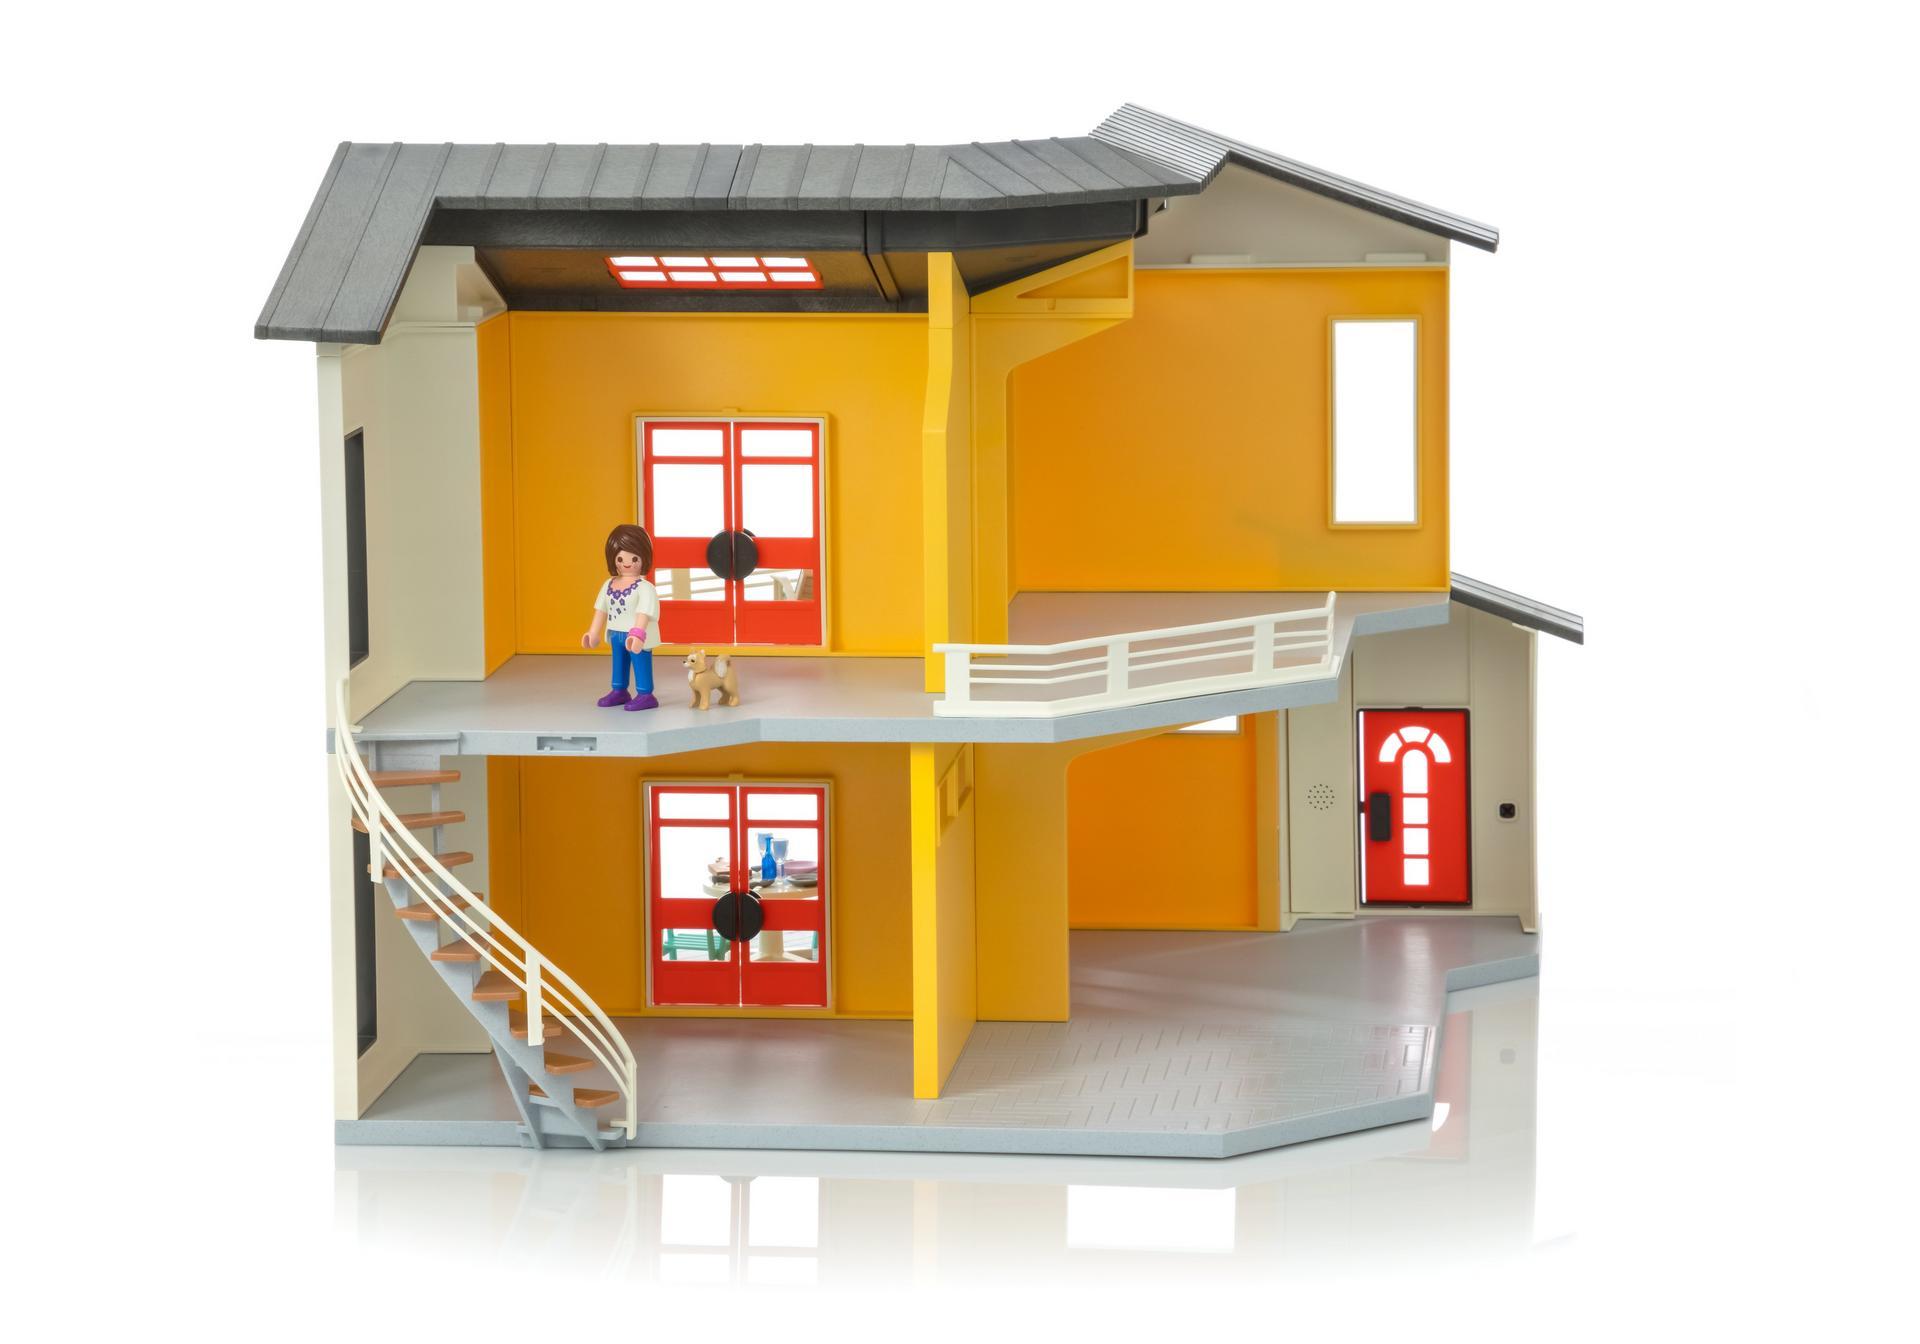 Playmobil Keuken 9269 : Playmobil küche modern. kare kraftwerk küche spülmittelspender